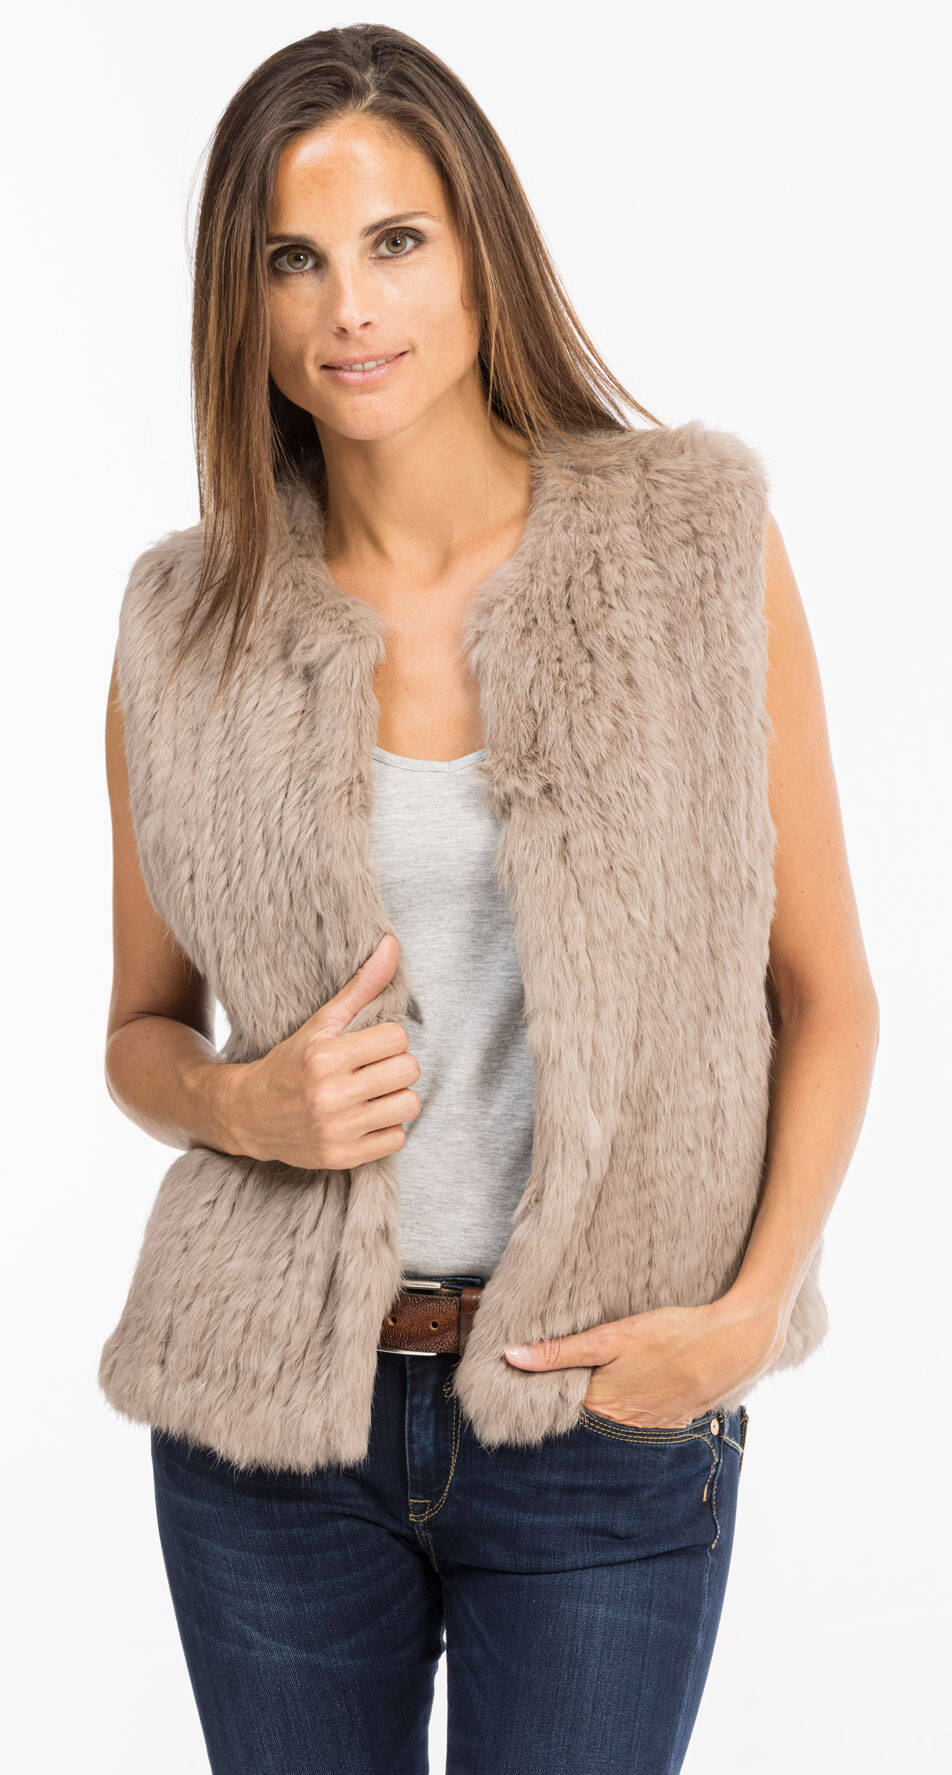 Vêtement en cuir Gilets cuir & fourrure  beige